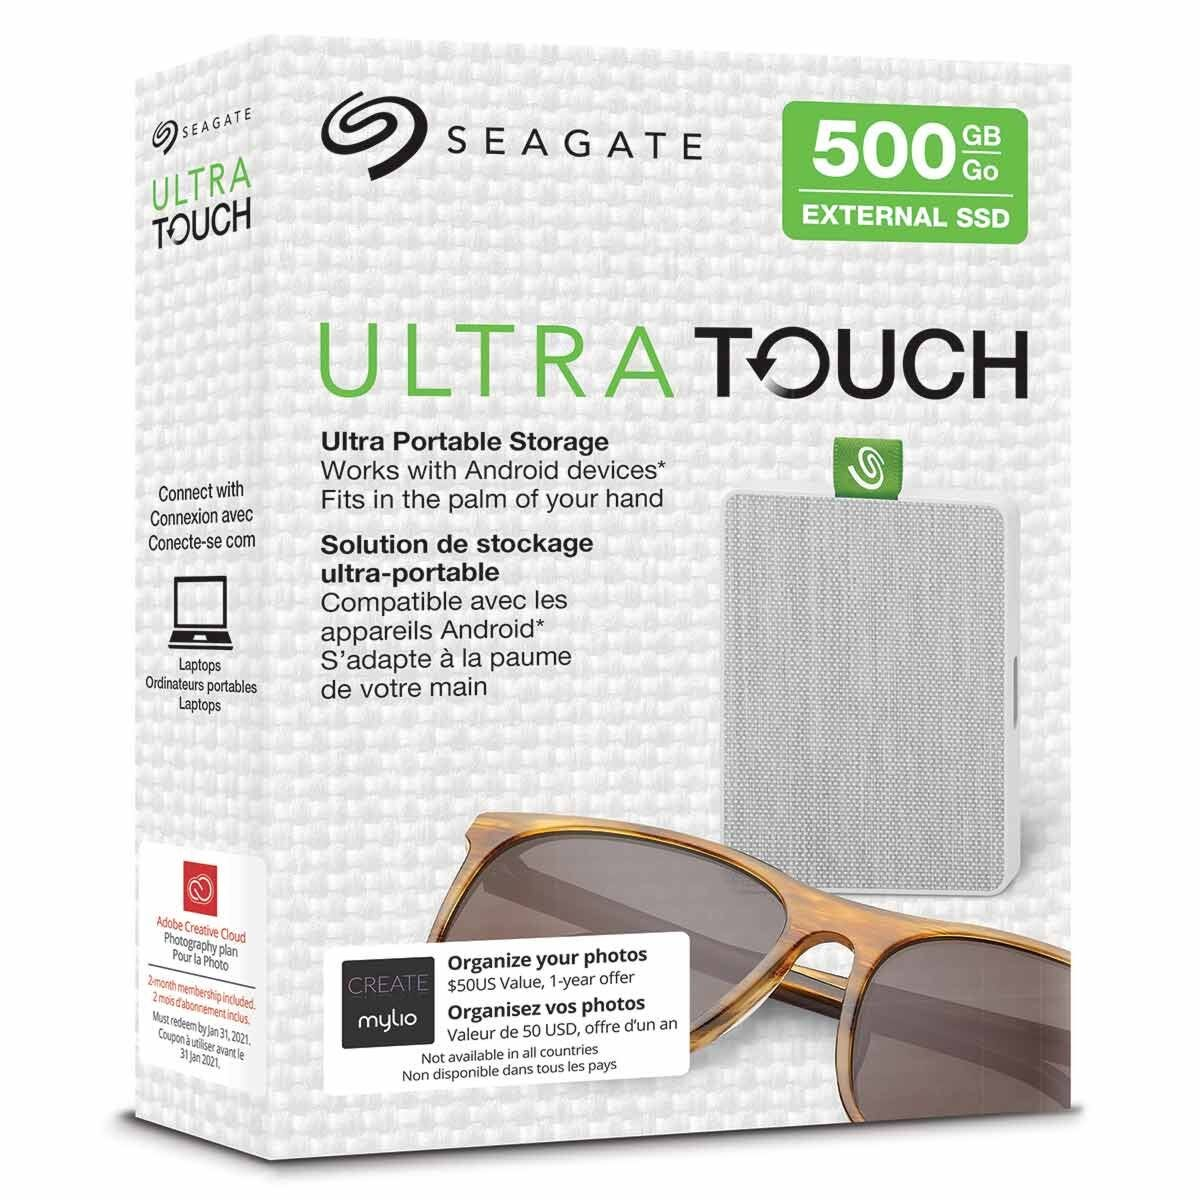 Seagate Ultra Touch Portable SSD 500GB